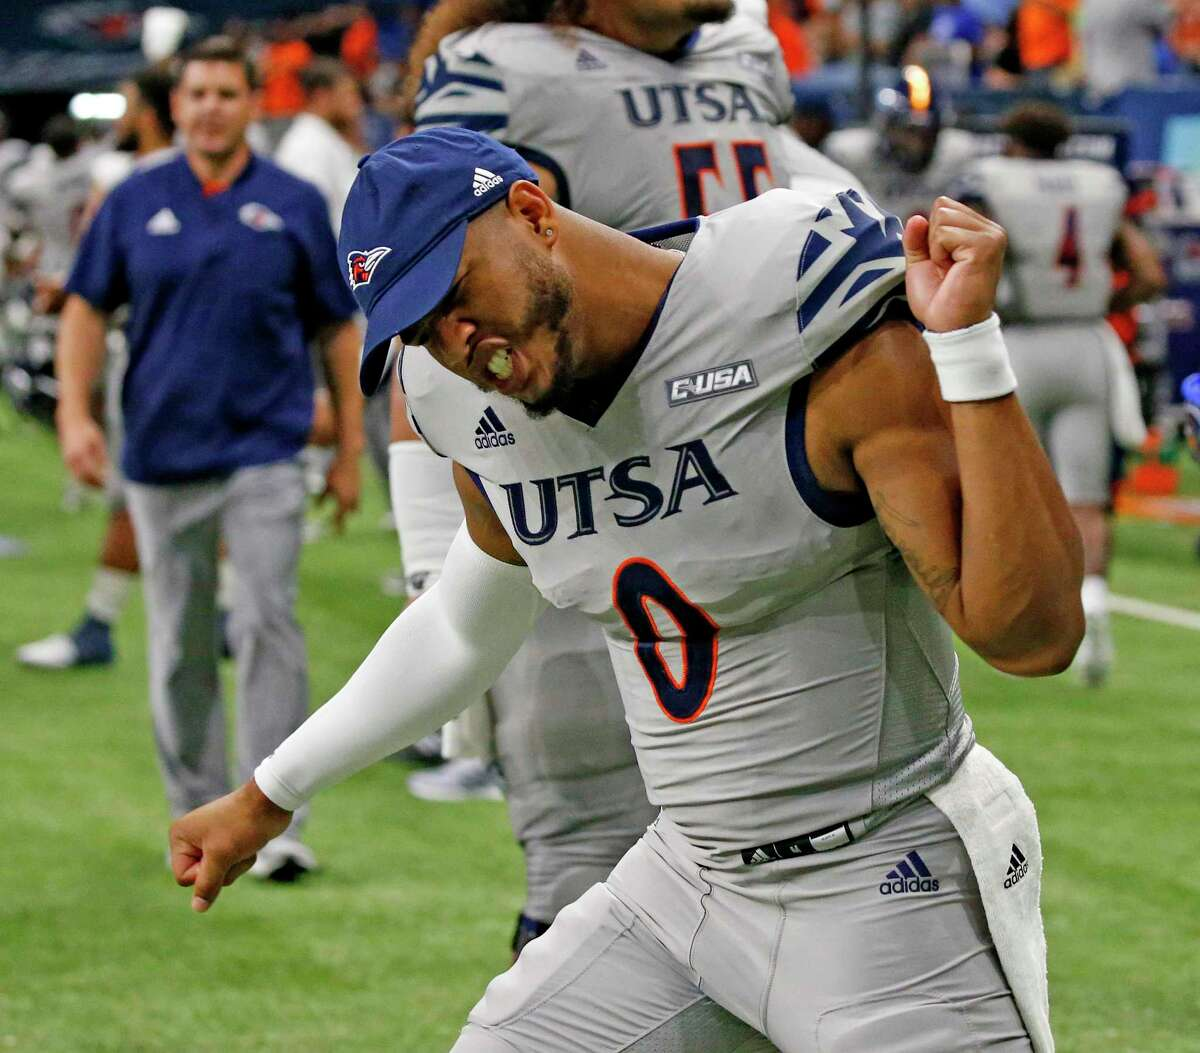 UTSA quarterback Frank Harris reacts at the end of the game. UTSA v Lamar on Saturday.